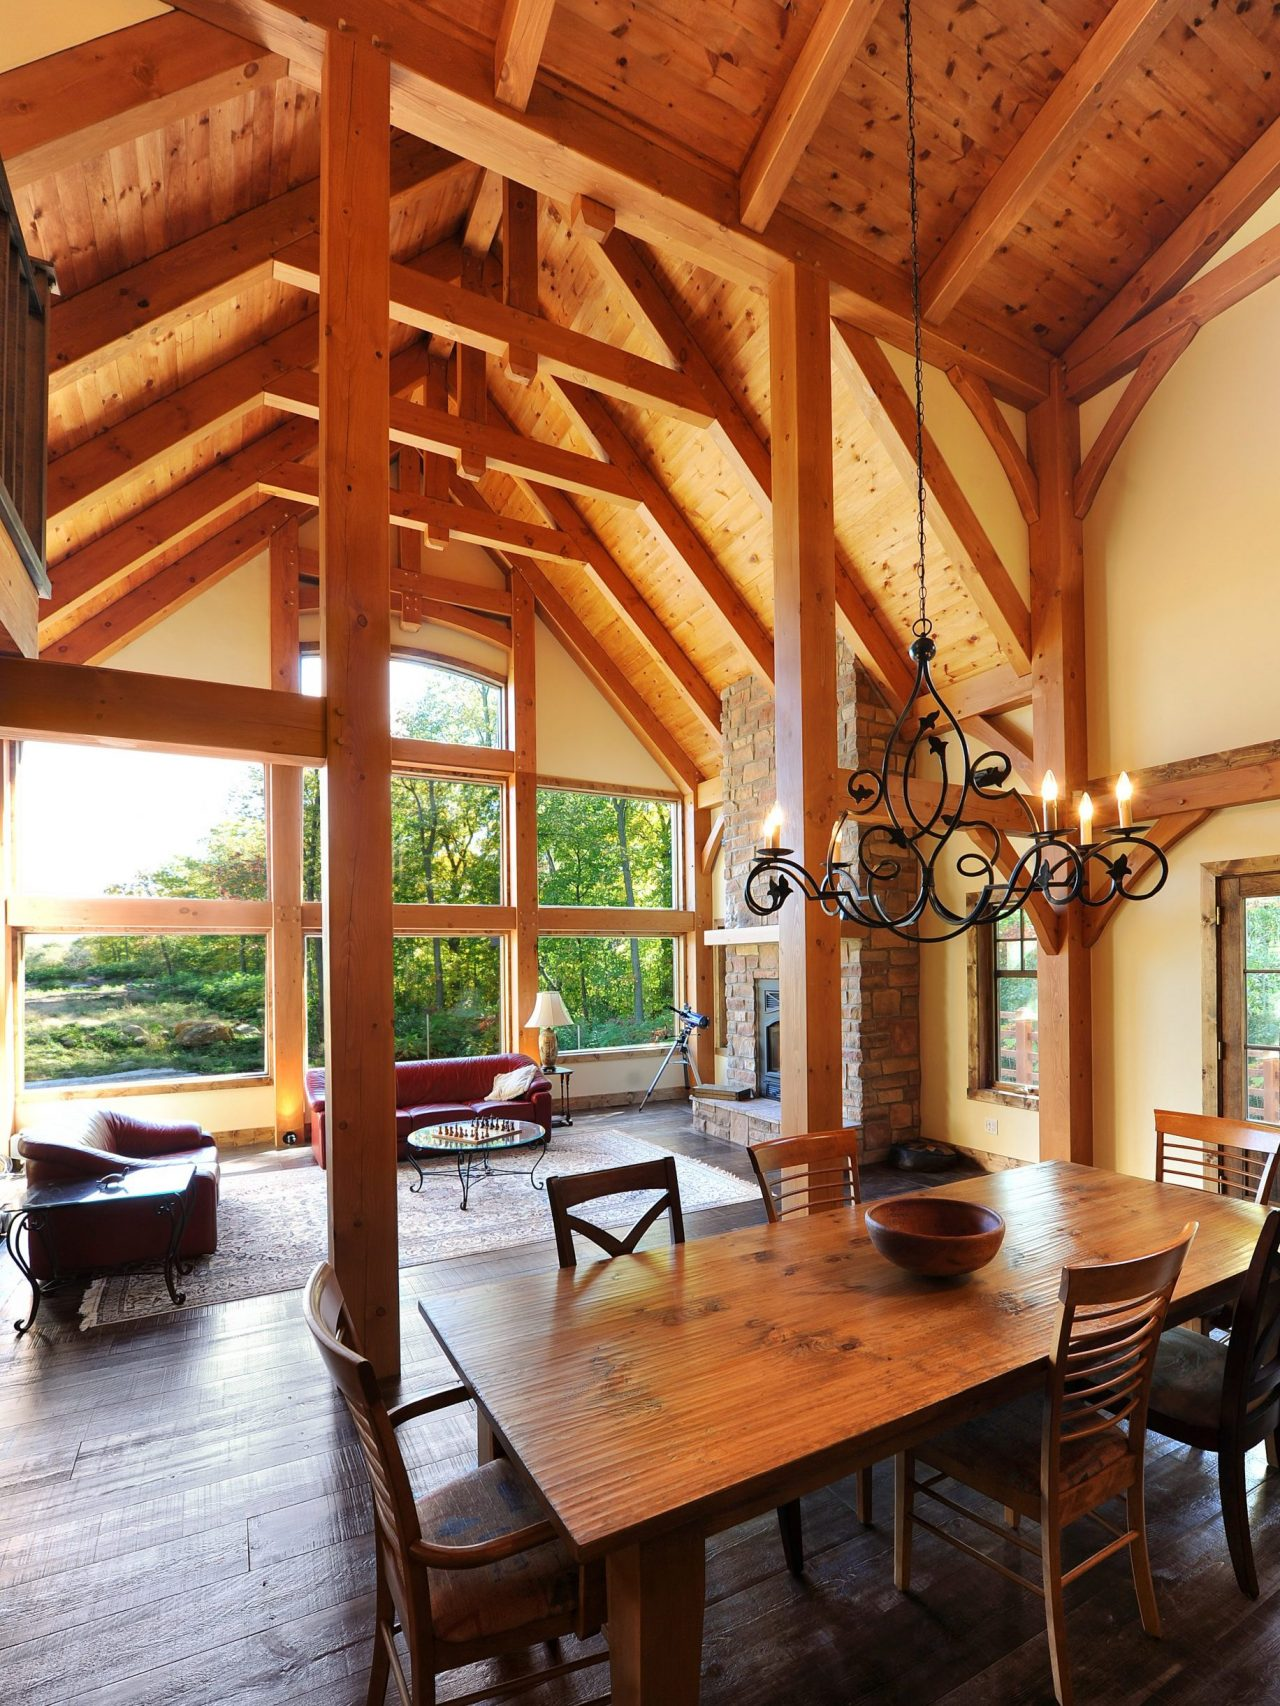 kalmia realisation classique kyo interieur general timberframe